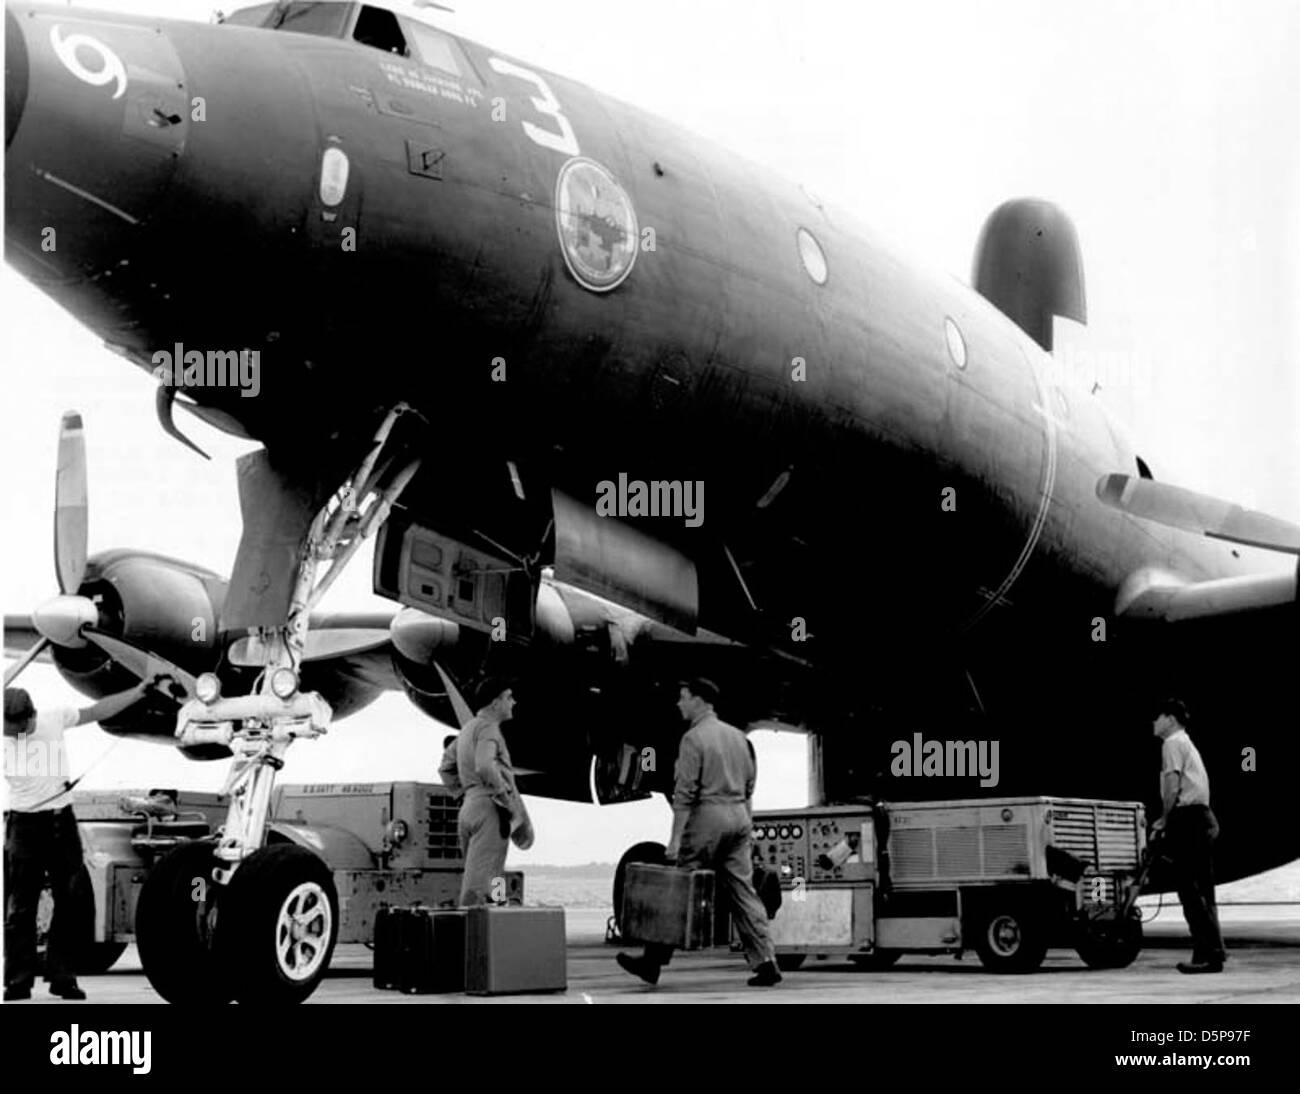 VW-4 MH-3 WEB - Stock Image